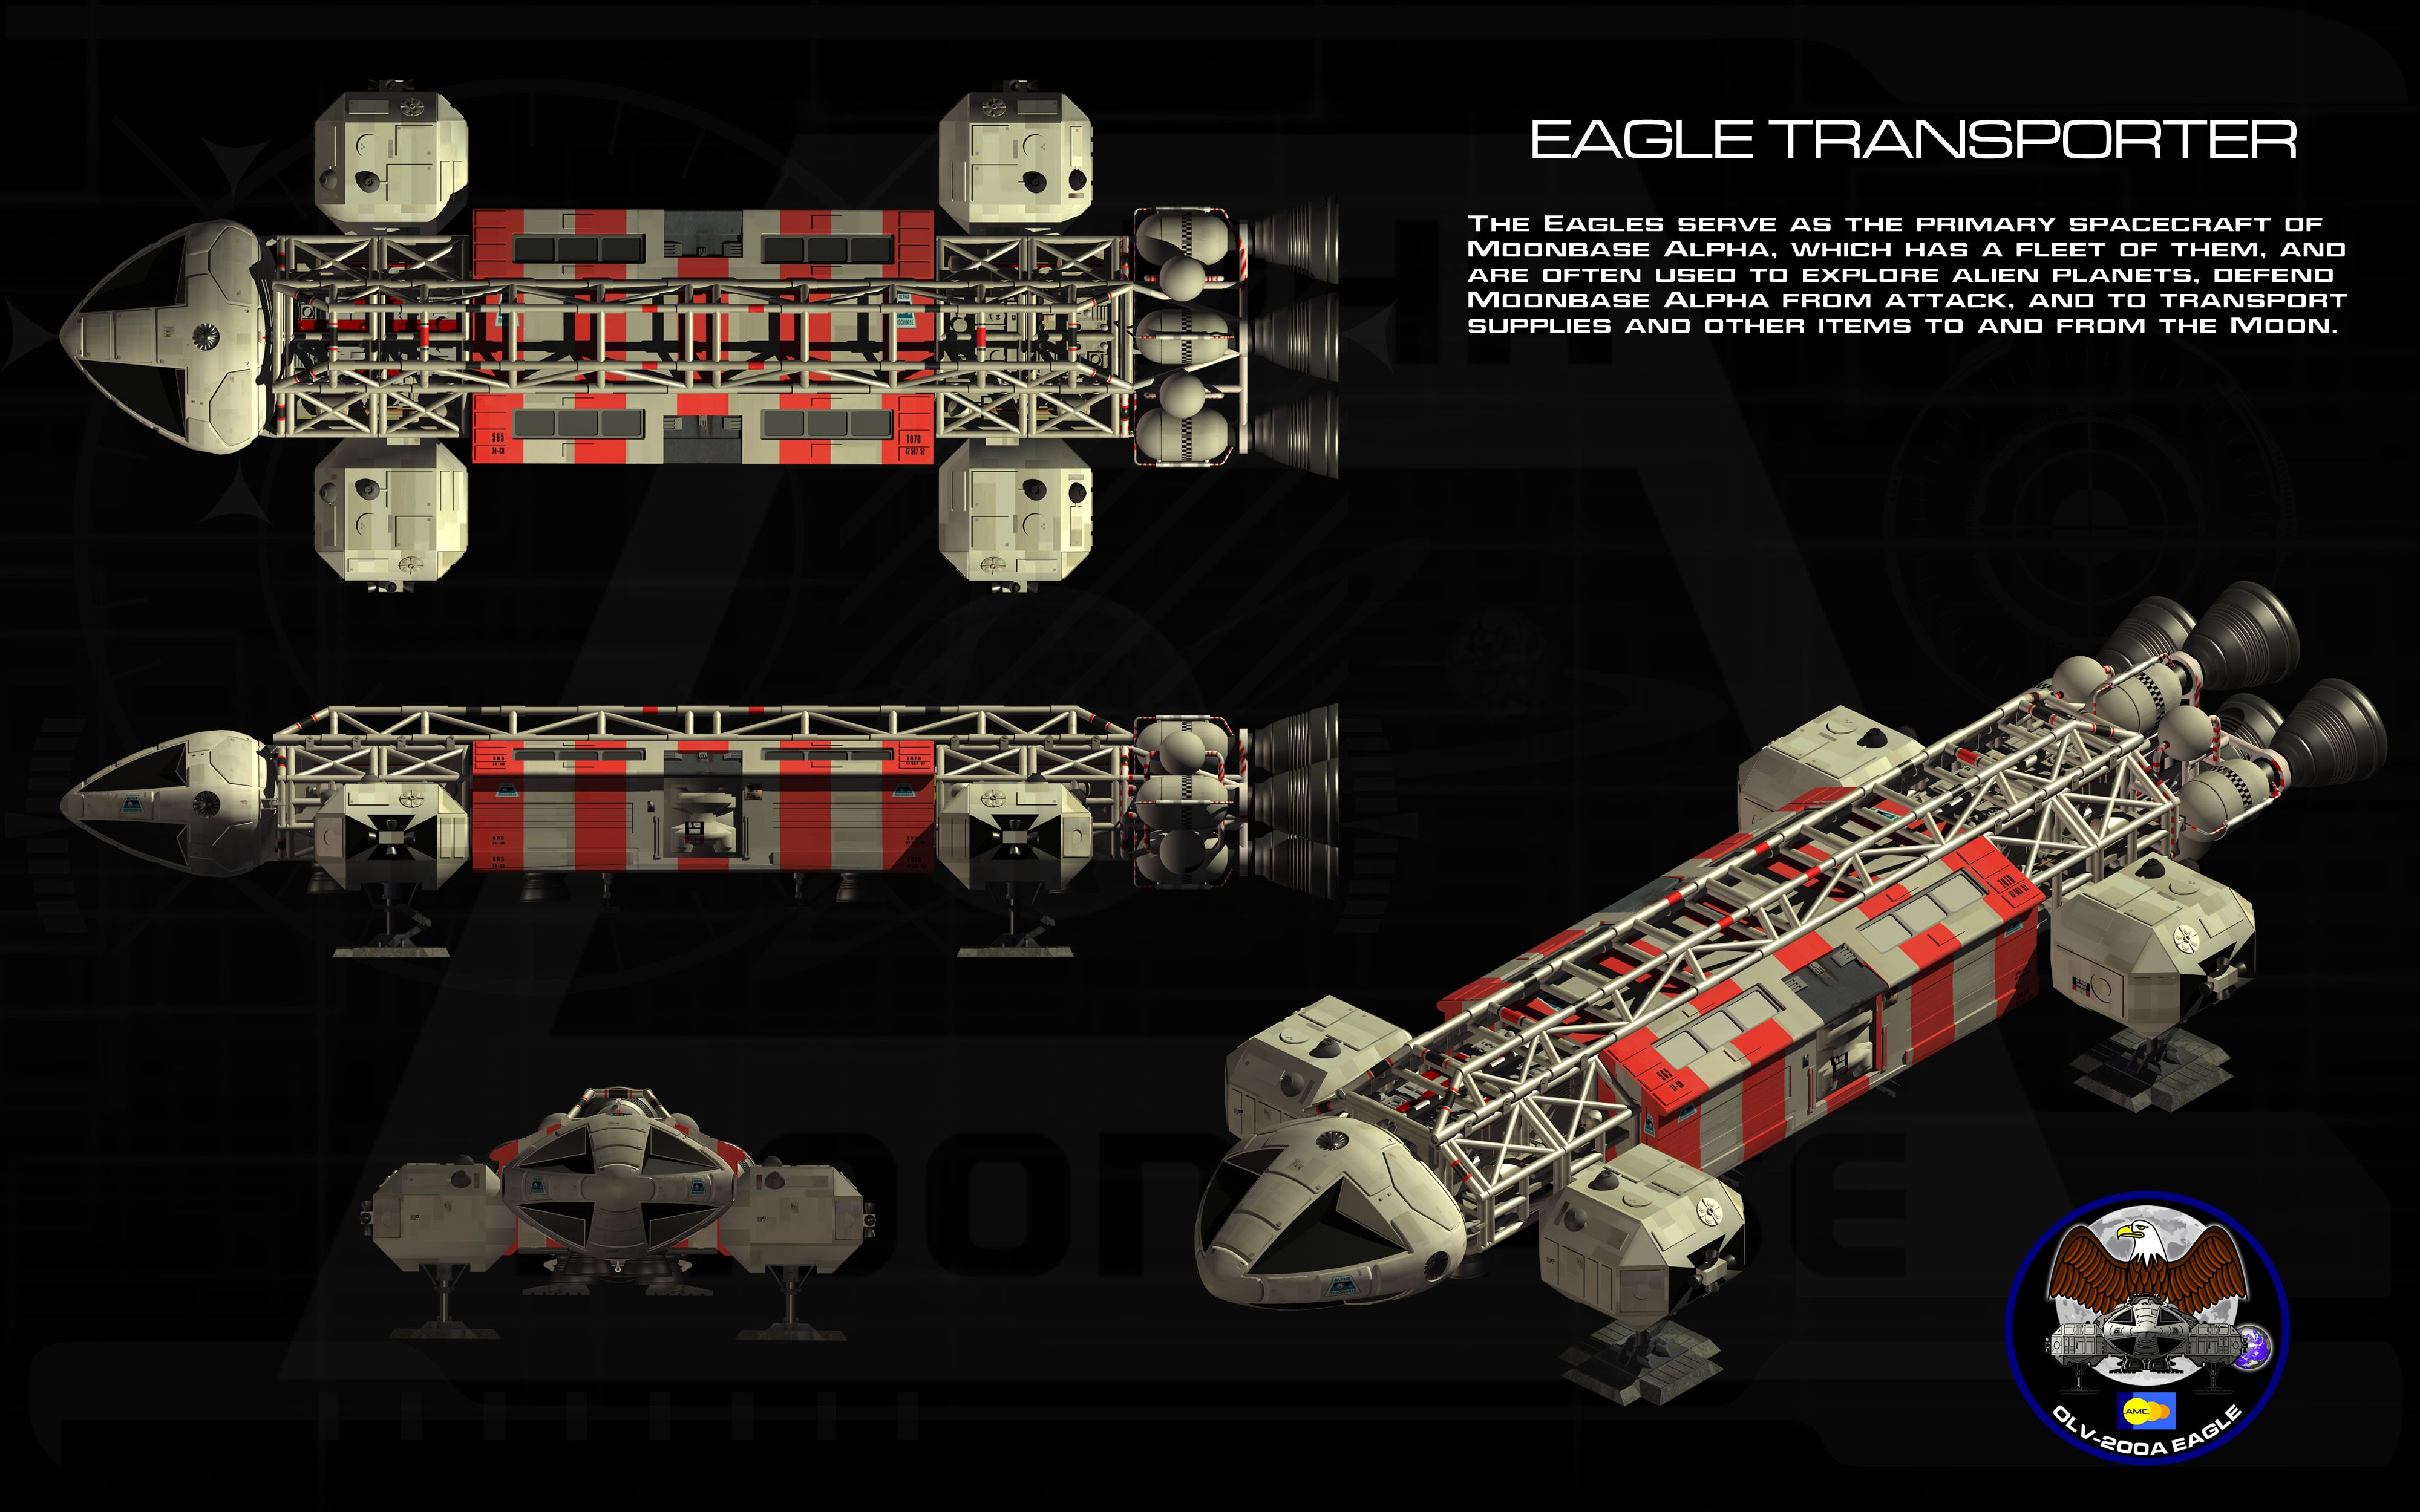 2001 A Space Odyssey Porn Video eagle transporter orthounusualsuspex on deviantart